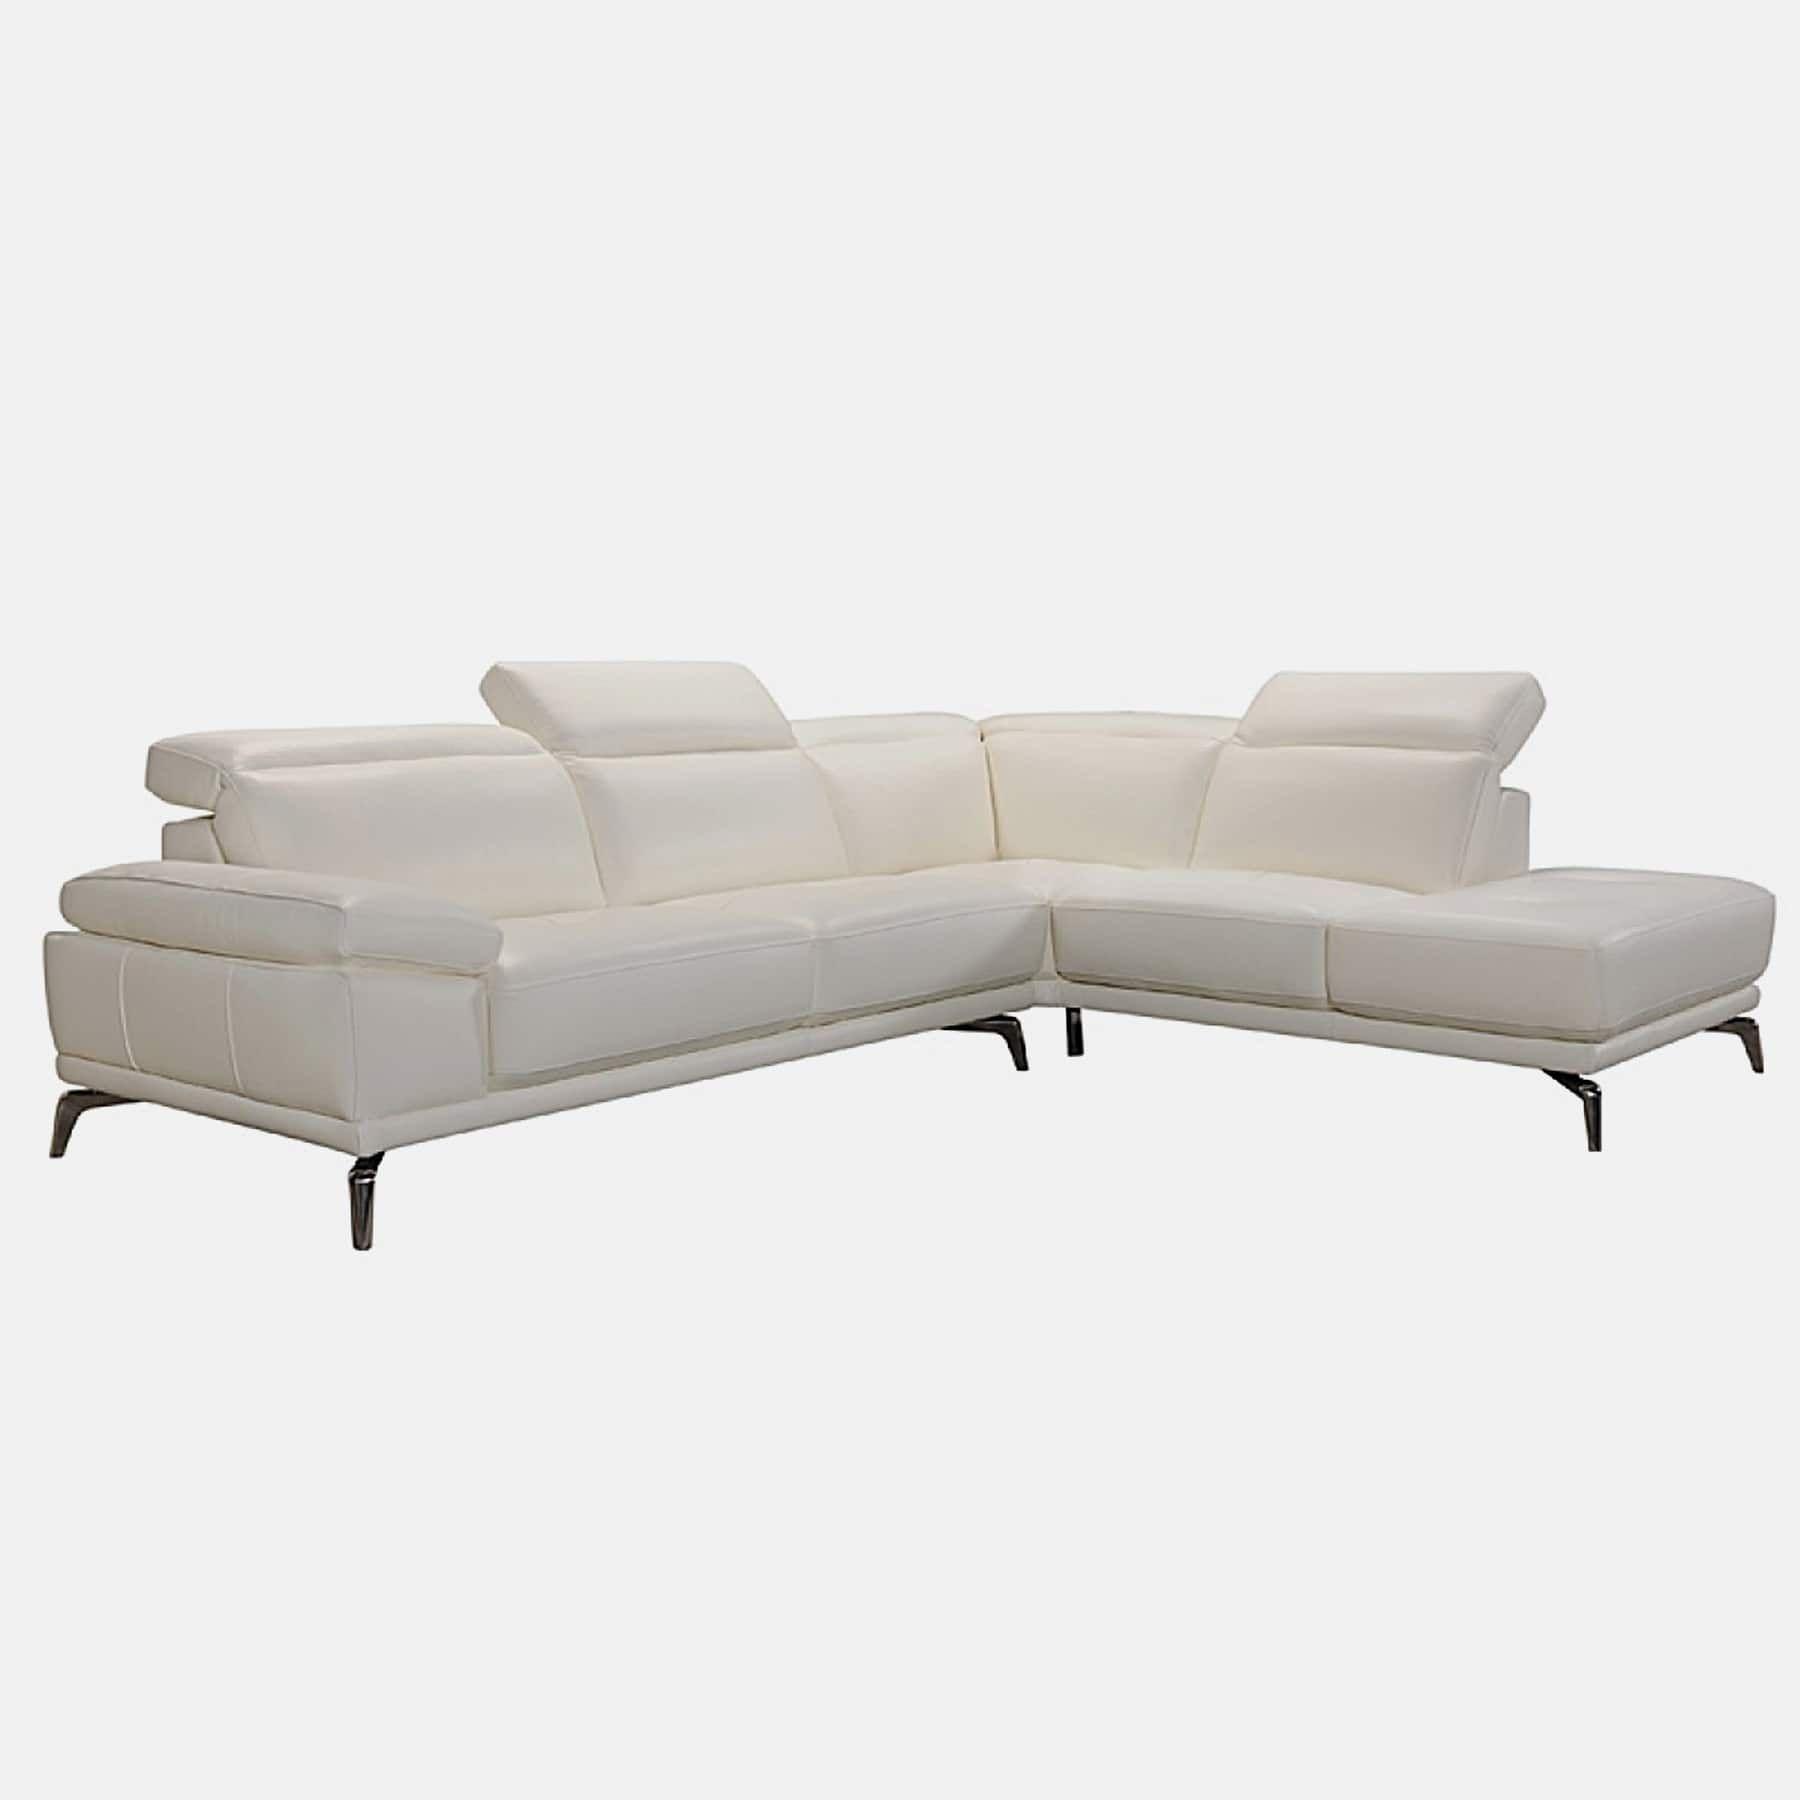 Rallye modern white leather lshaped sofa white leather modern